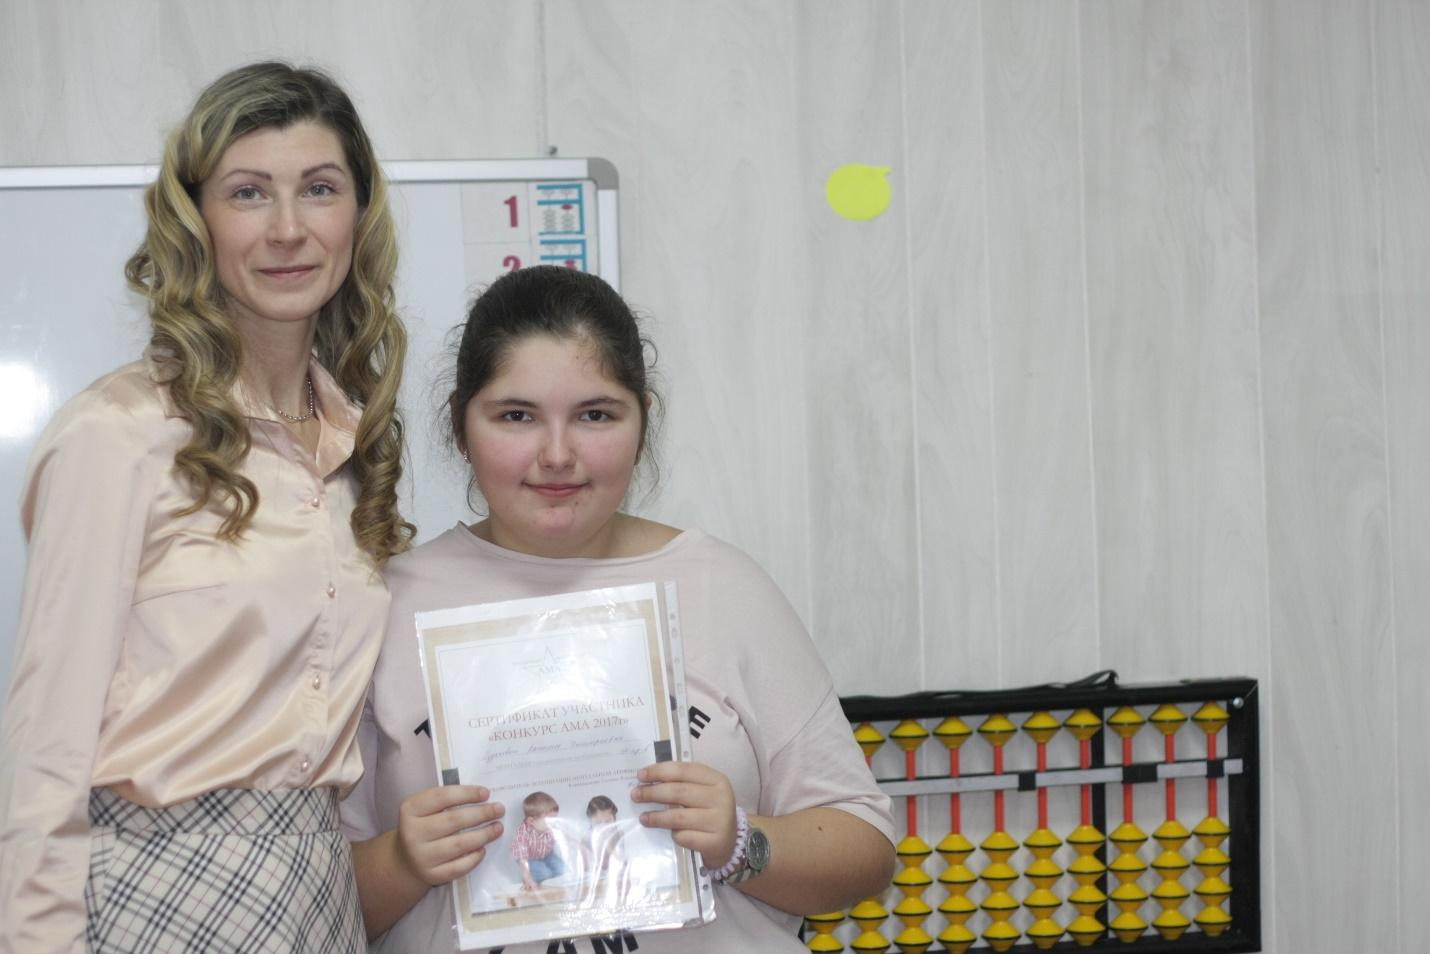 C:\Users\Evgen&Tatiana\Documents\Татьяна\МЕНТАЛЬНАЯ МАТЕМАТИКА\фото и видео занятий, дети\Конкурс 10.12.17\IMG_6676.JPG